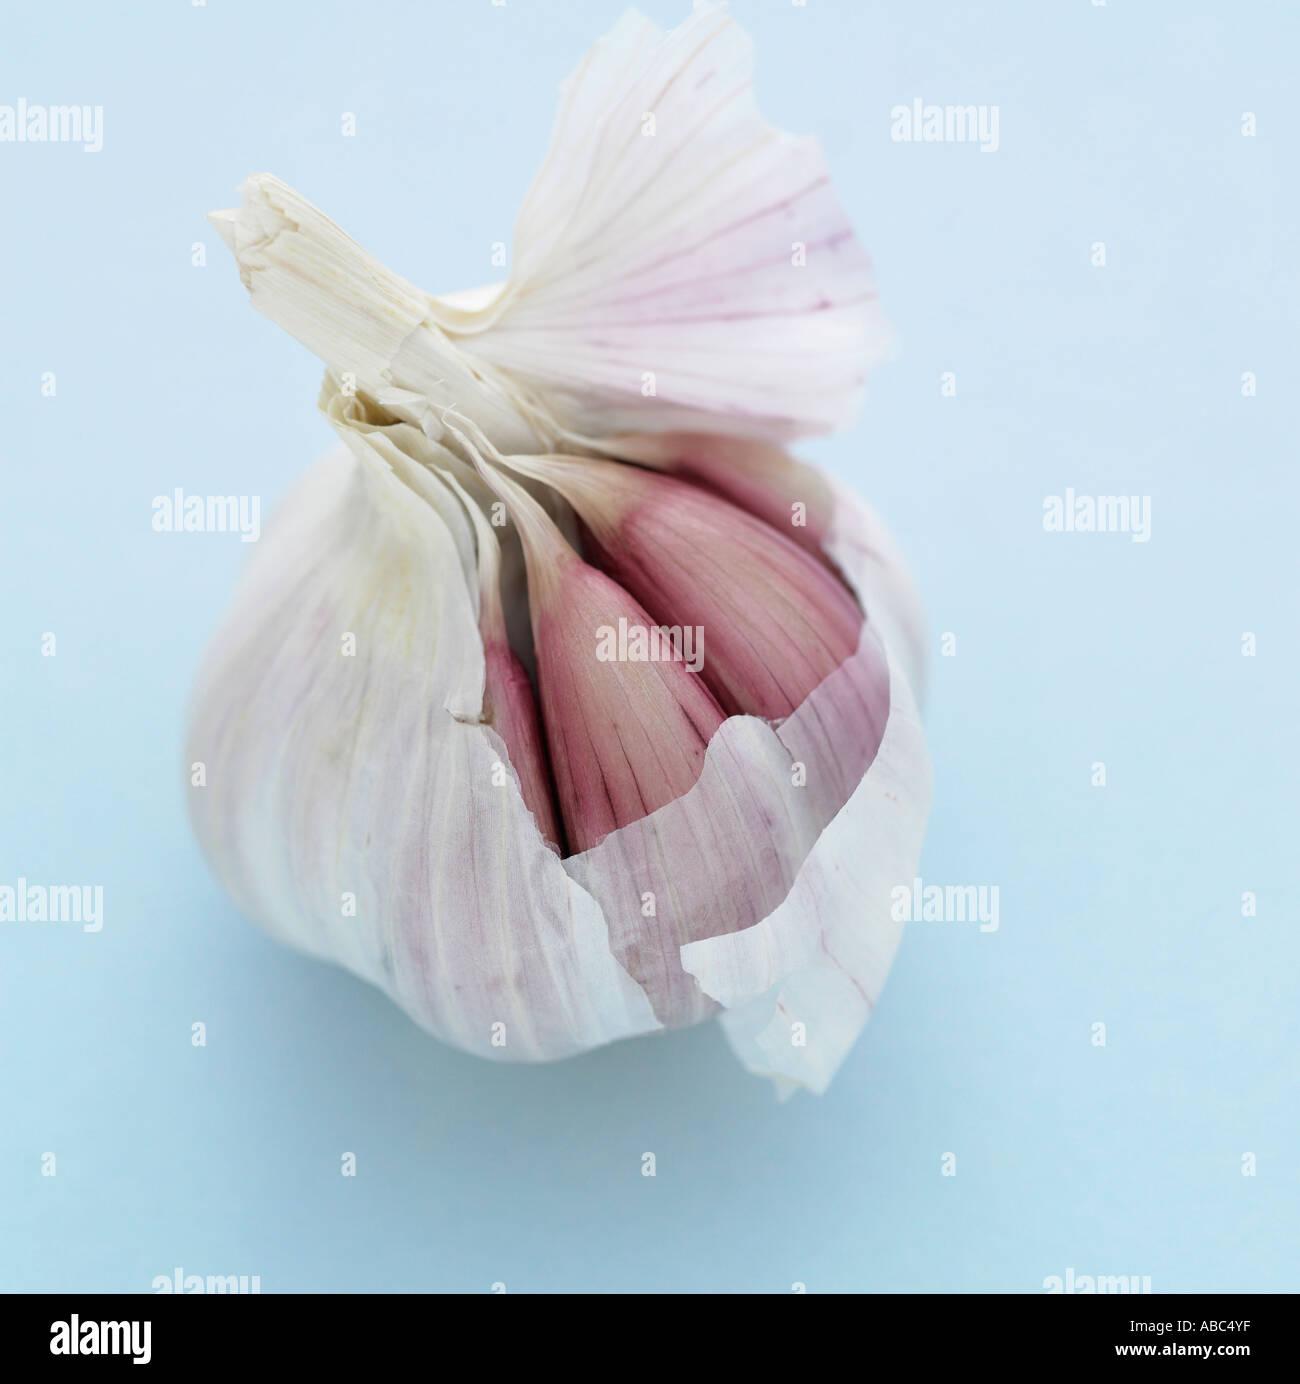 Garlic on pale blue background - Stock Image